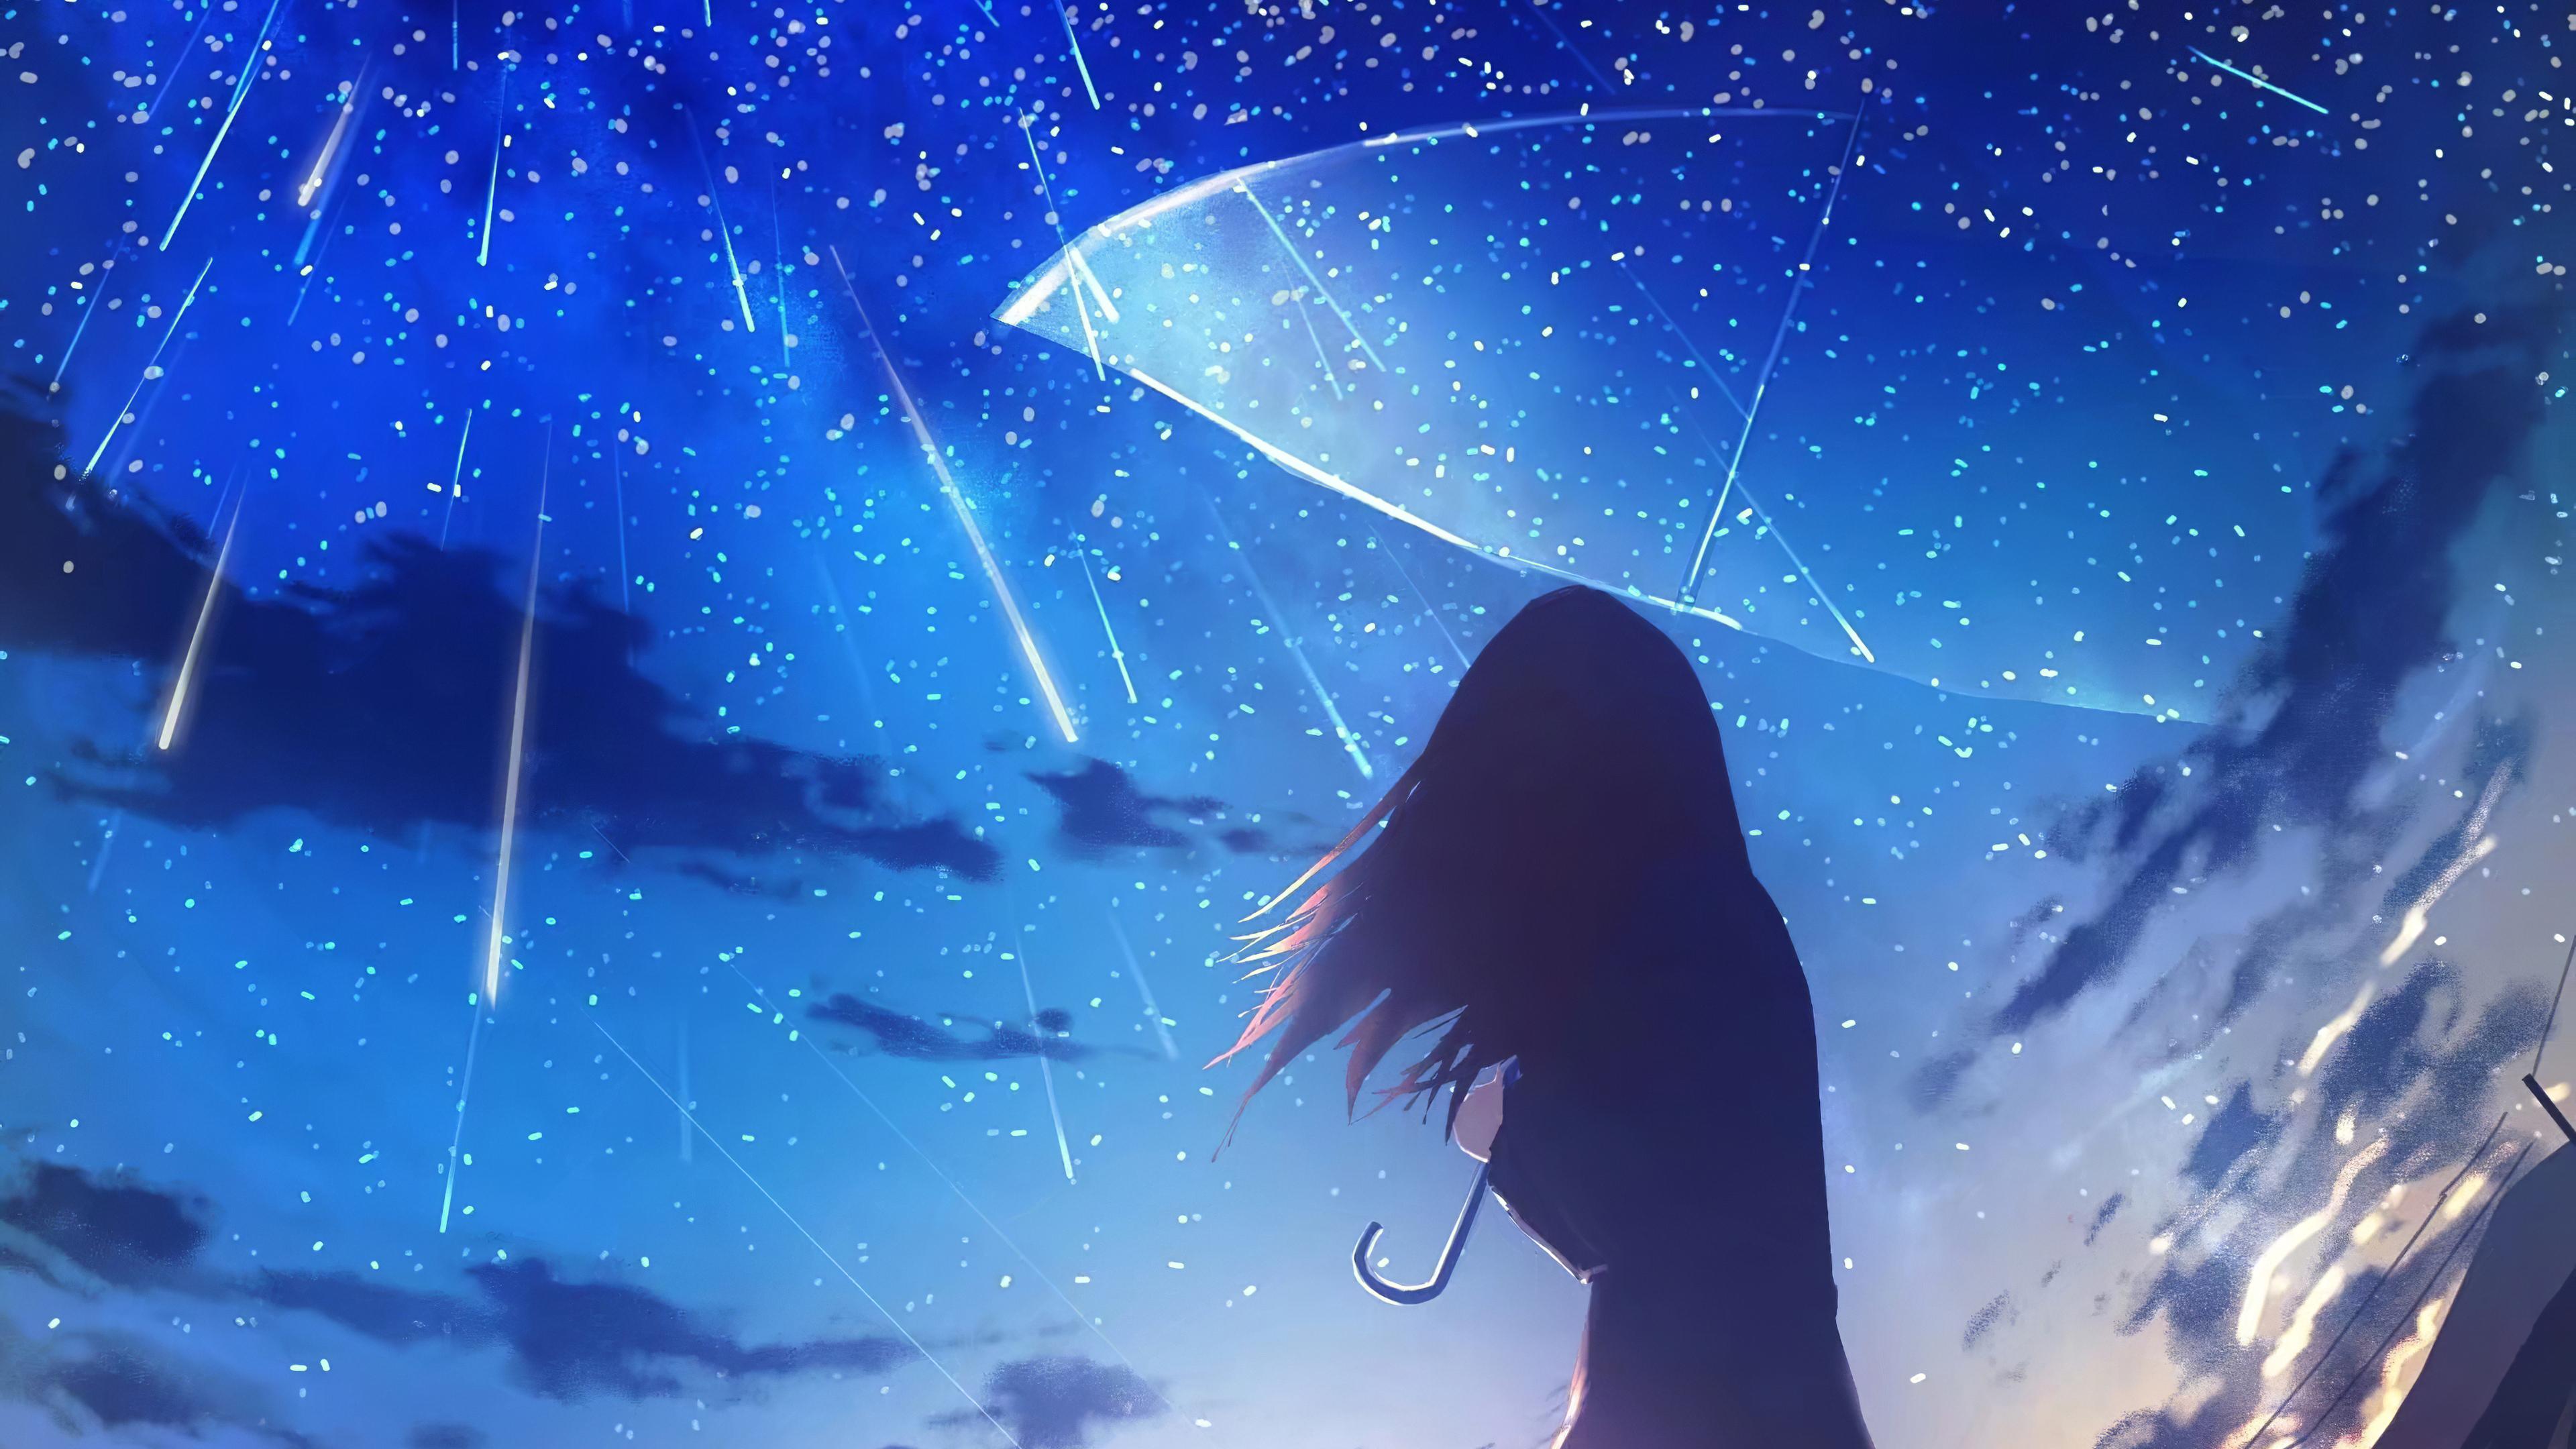 3840x2160 Anime Girl Umbrella Rain 4k 4k HD 4k Wallpapers ...